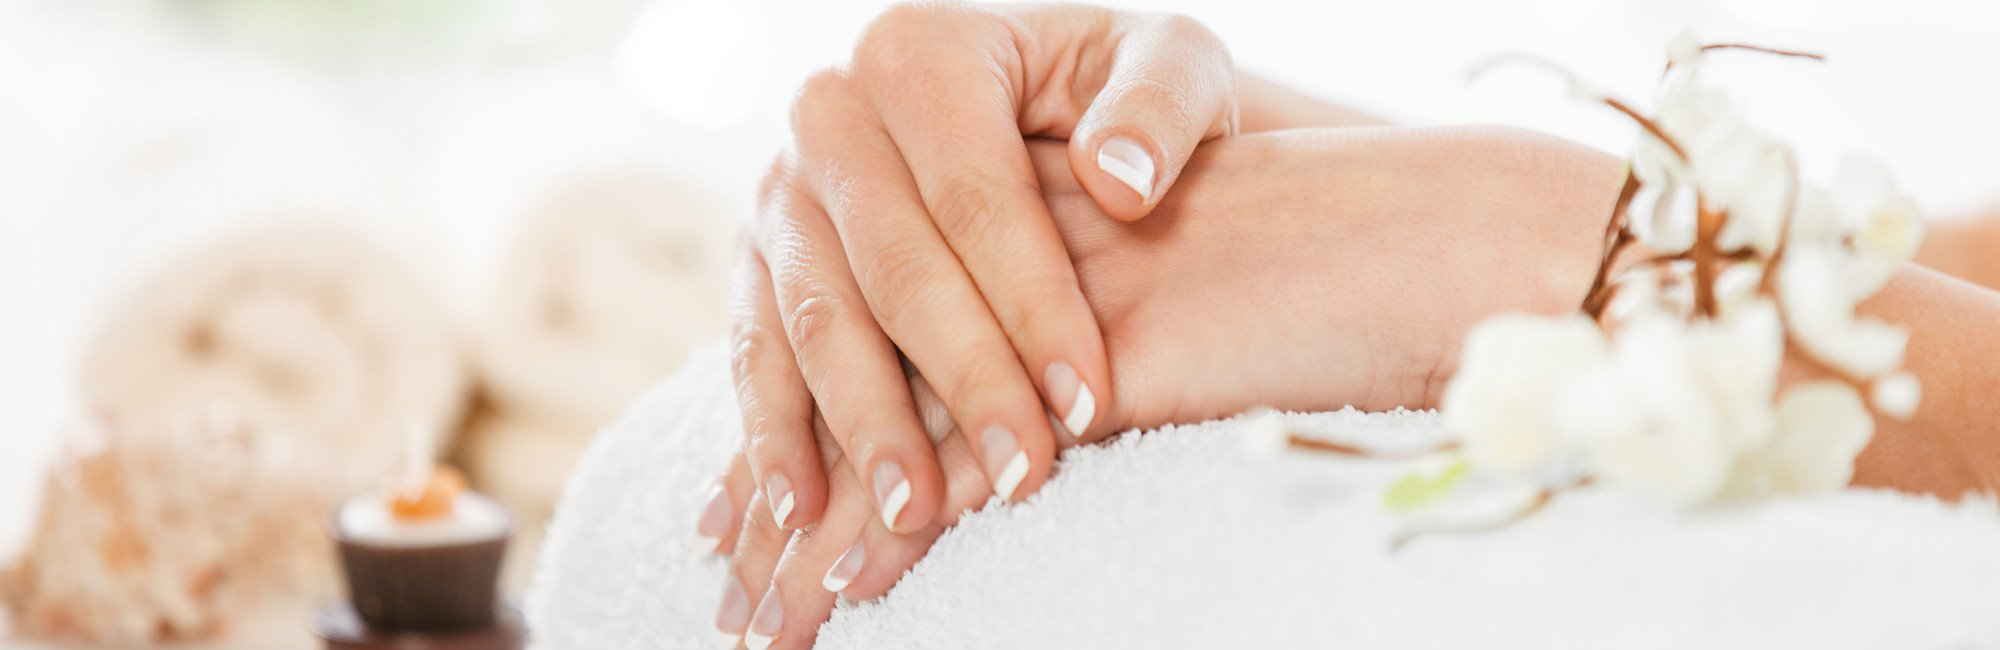 Crantock Bay Spa Manicure - Spa Treatments